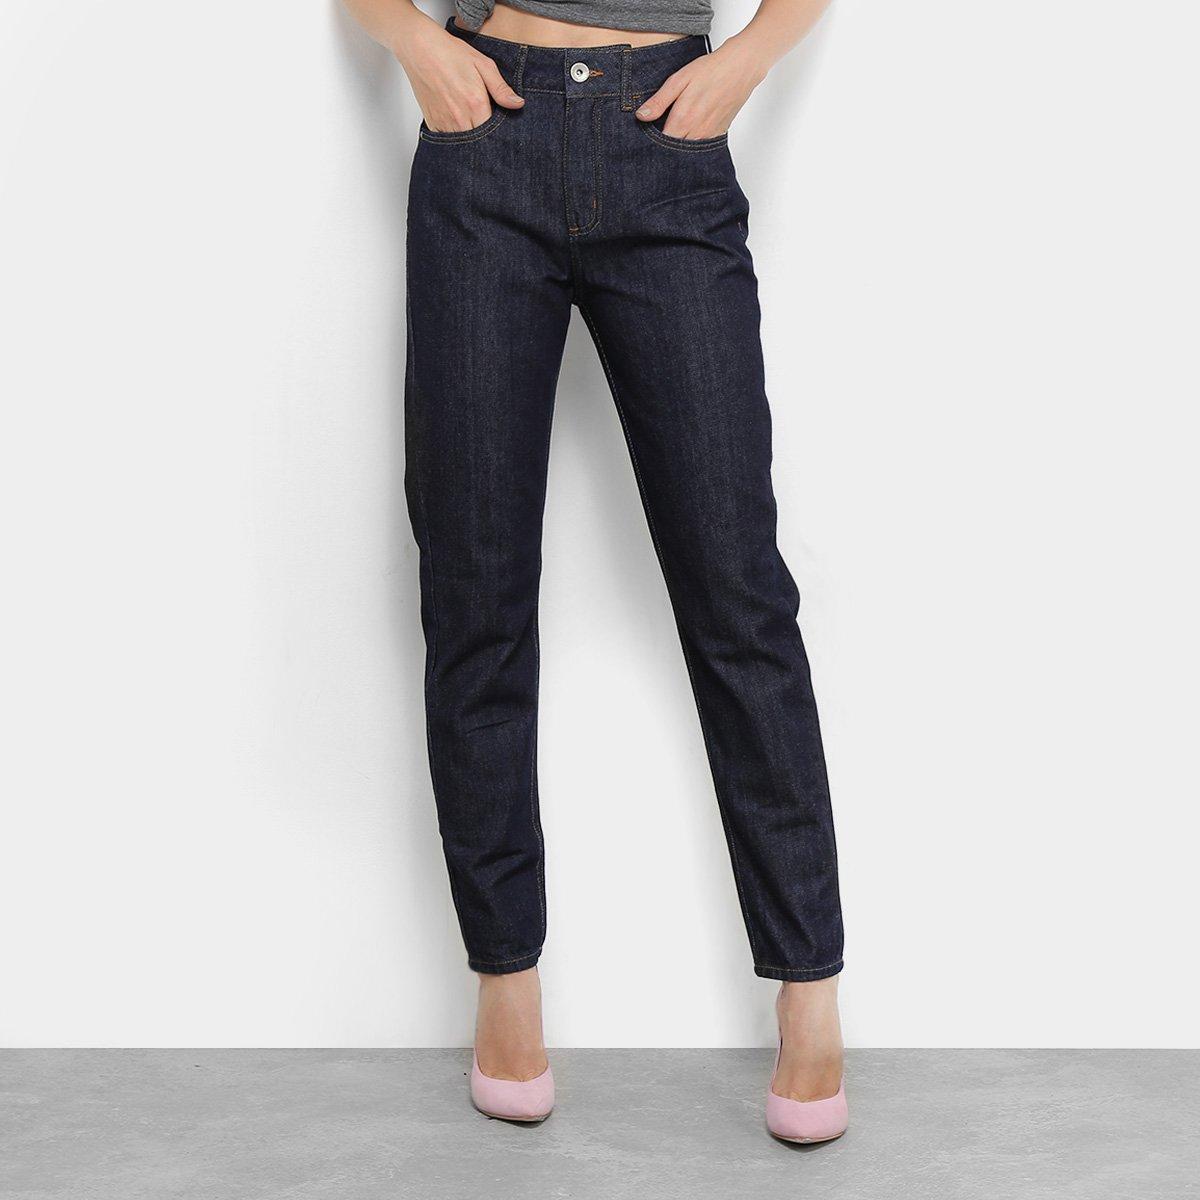 Calça Jeans Colcci Suki Cintura Média Feminino